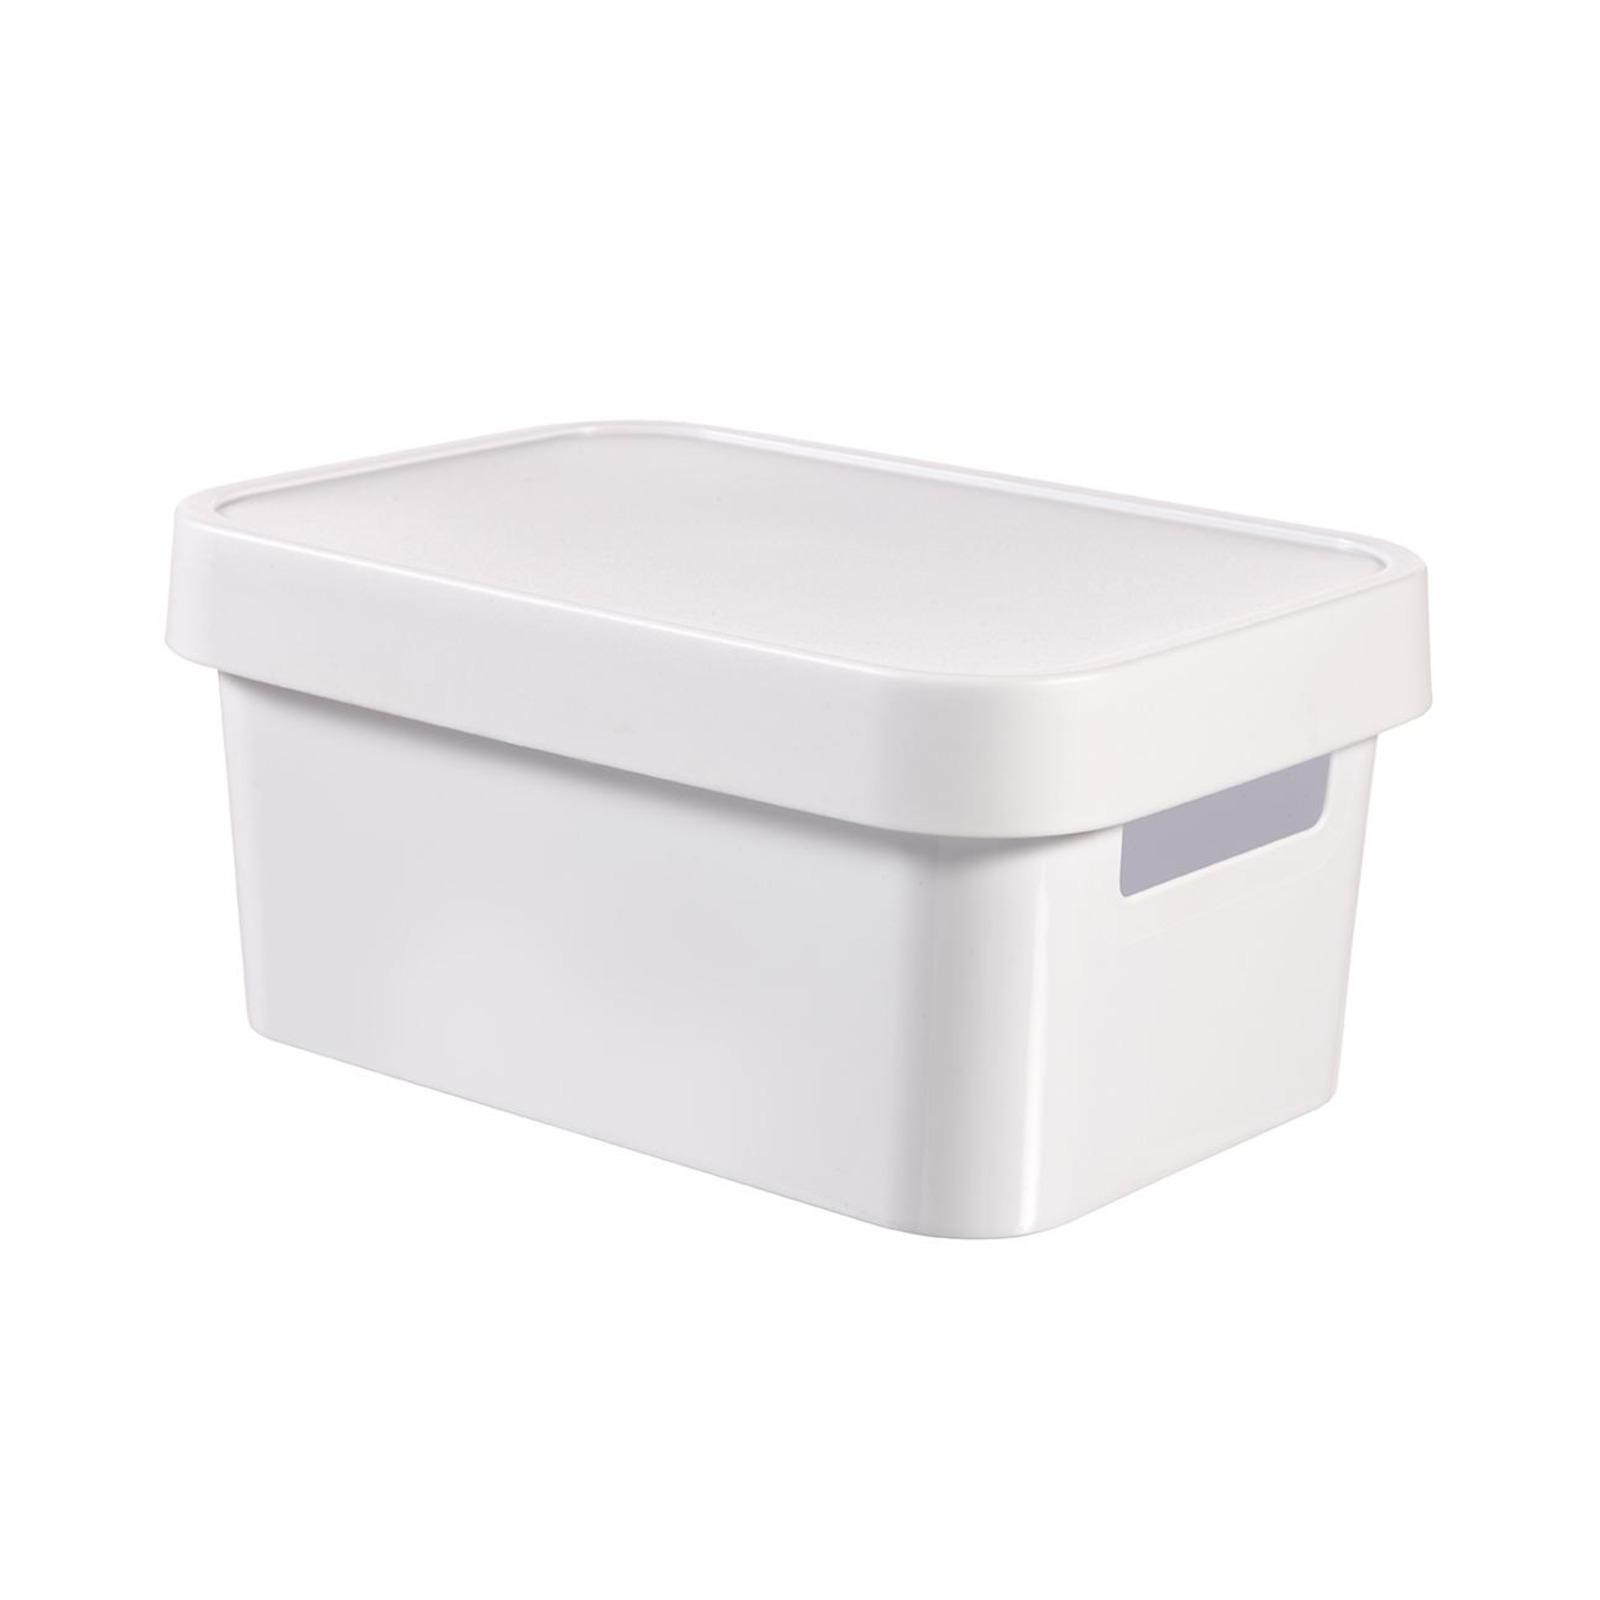 CURVER Infinity Box 4.5L + Lid White